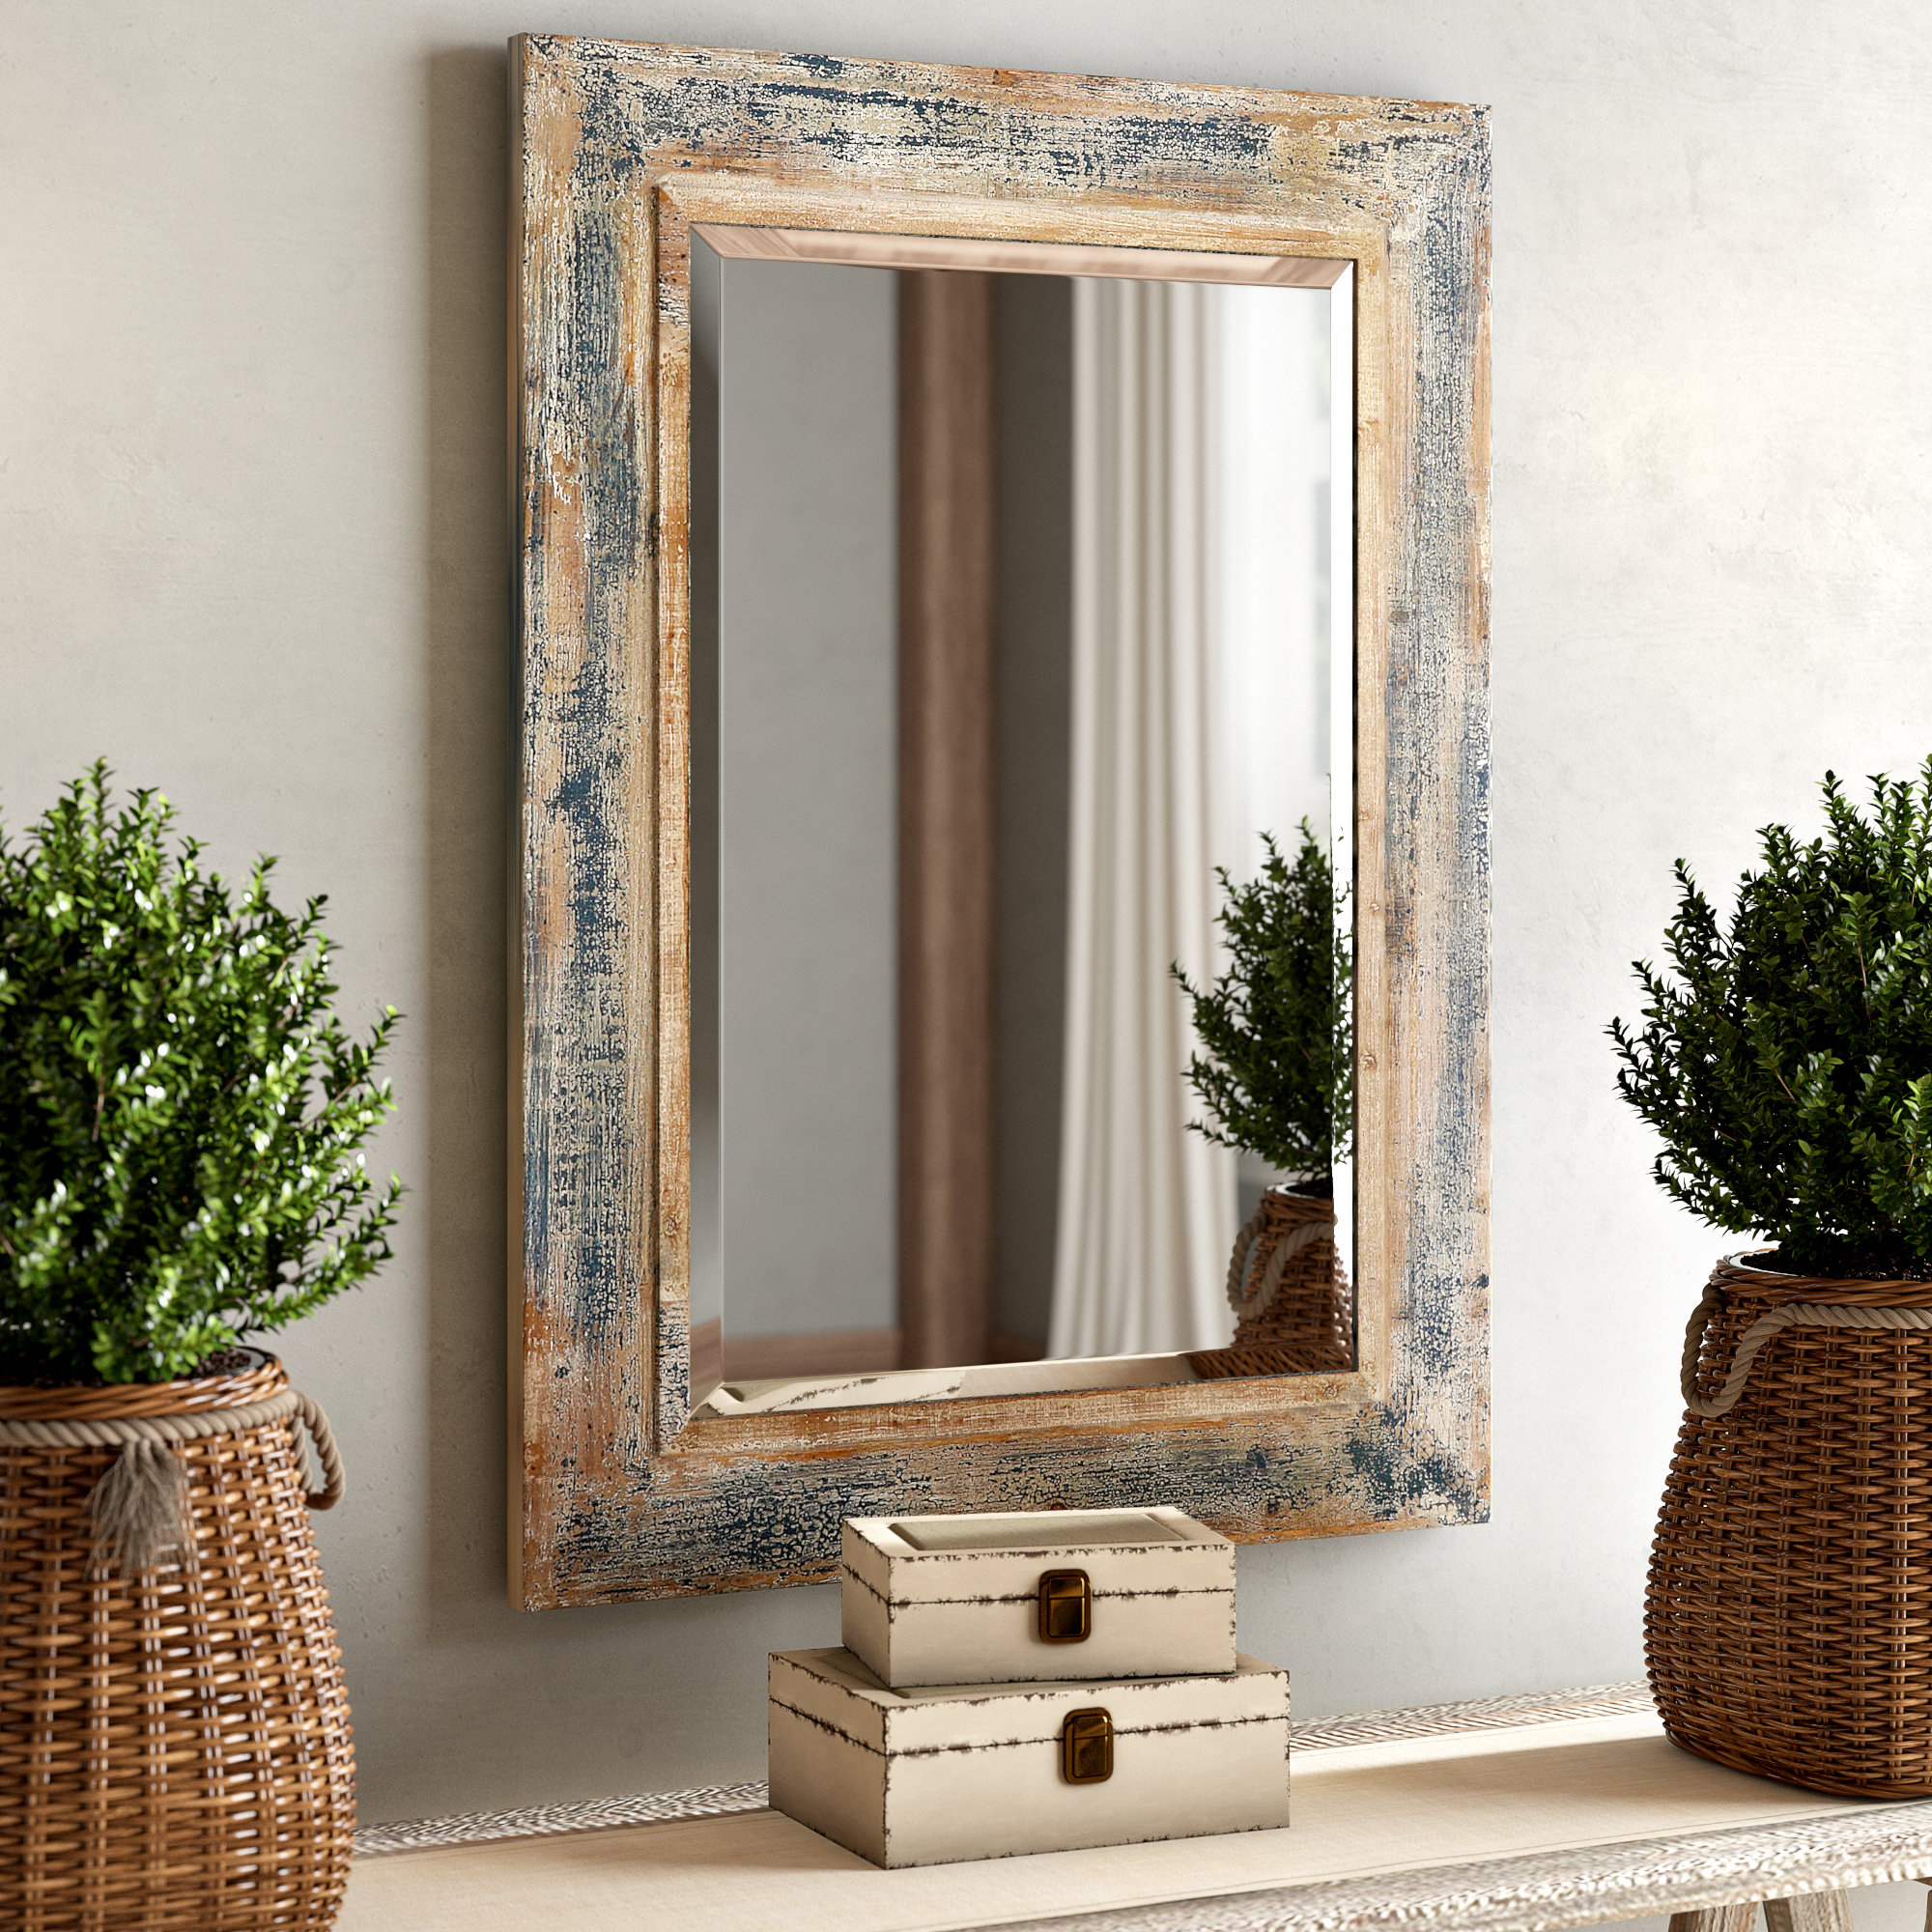 Wells Rectangular Mirror | Wayfair Regarding Lugo Rectangle Accent Mirrors (Image 18 of 20)